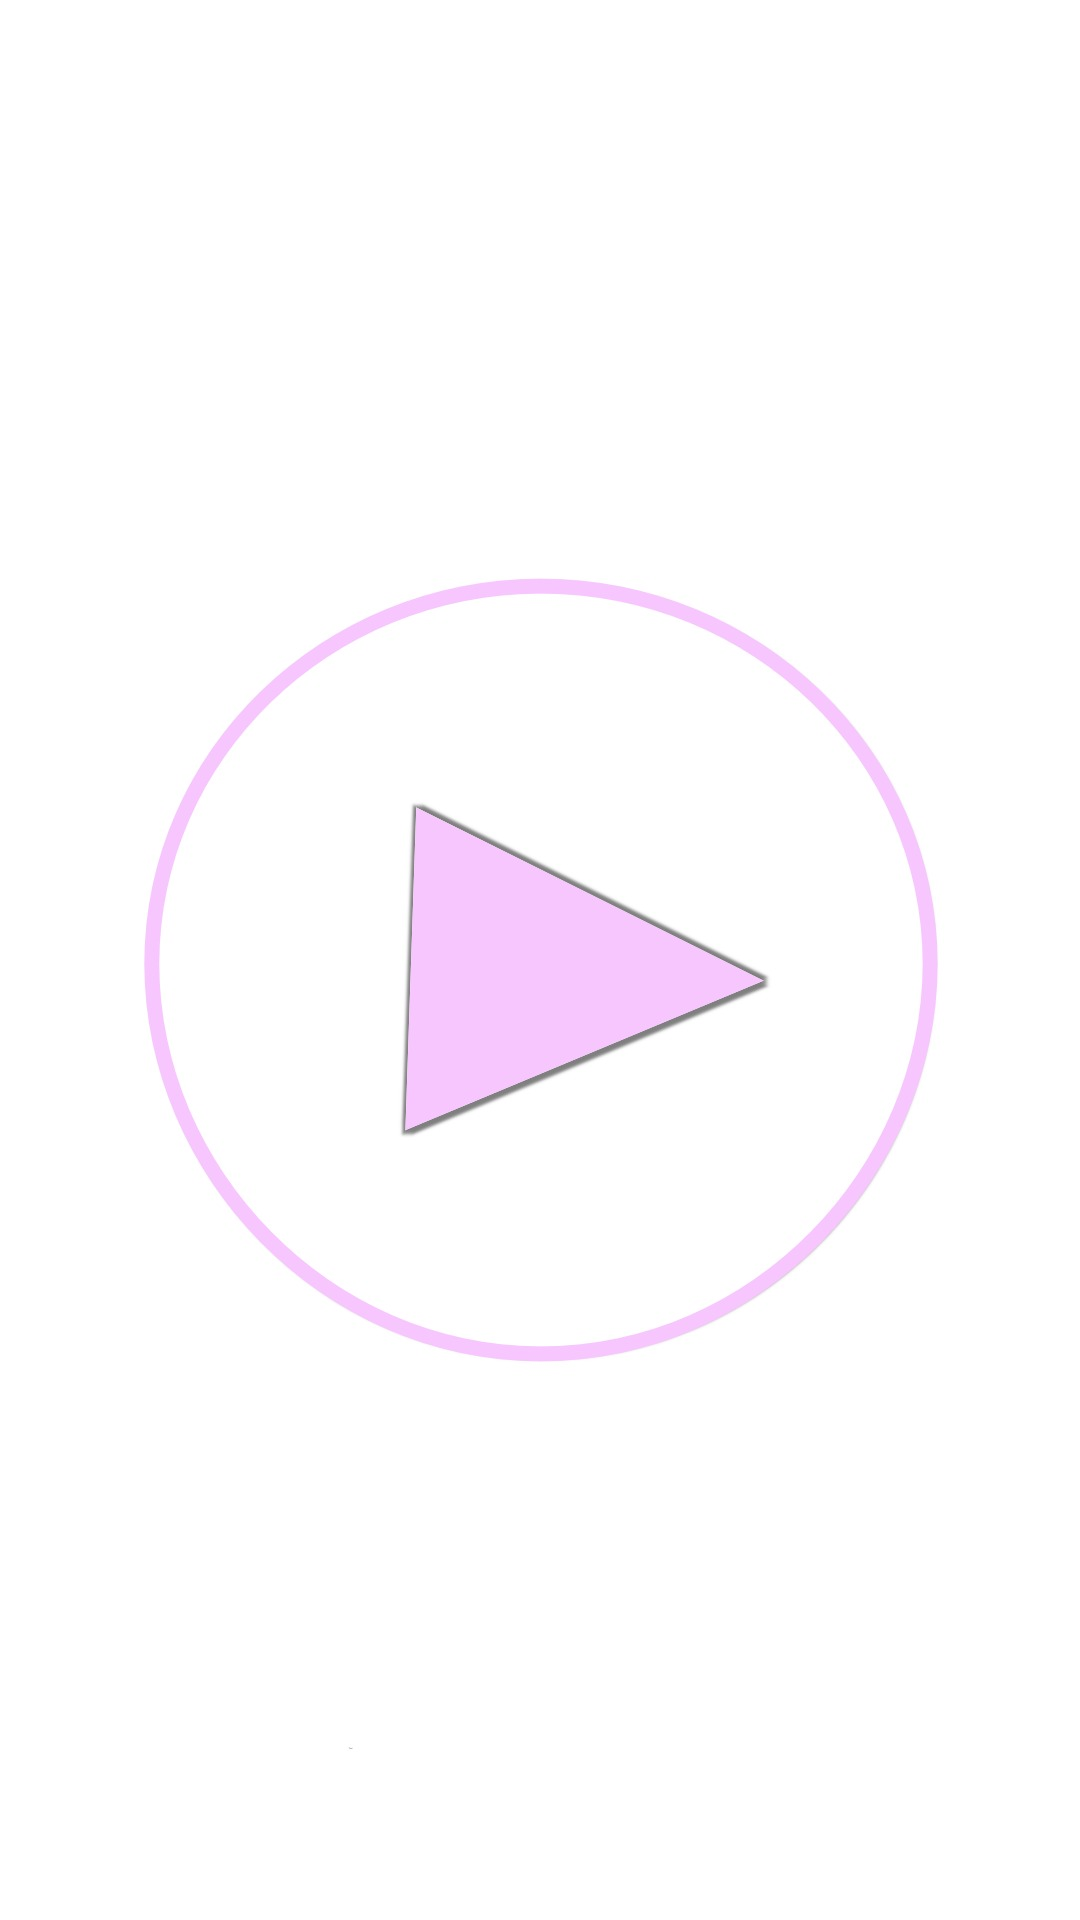 Instagram-cover-play-pinkwhite-lotnotes.com.jpg